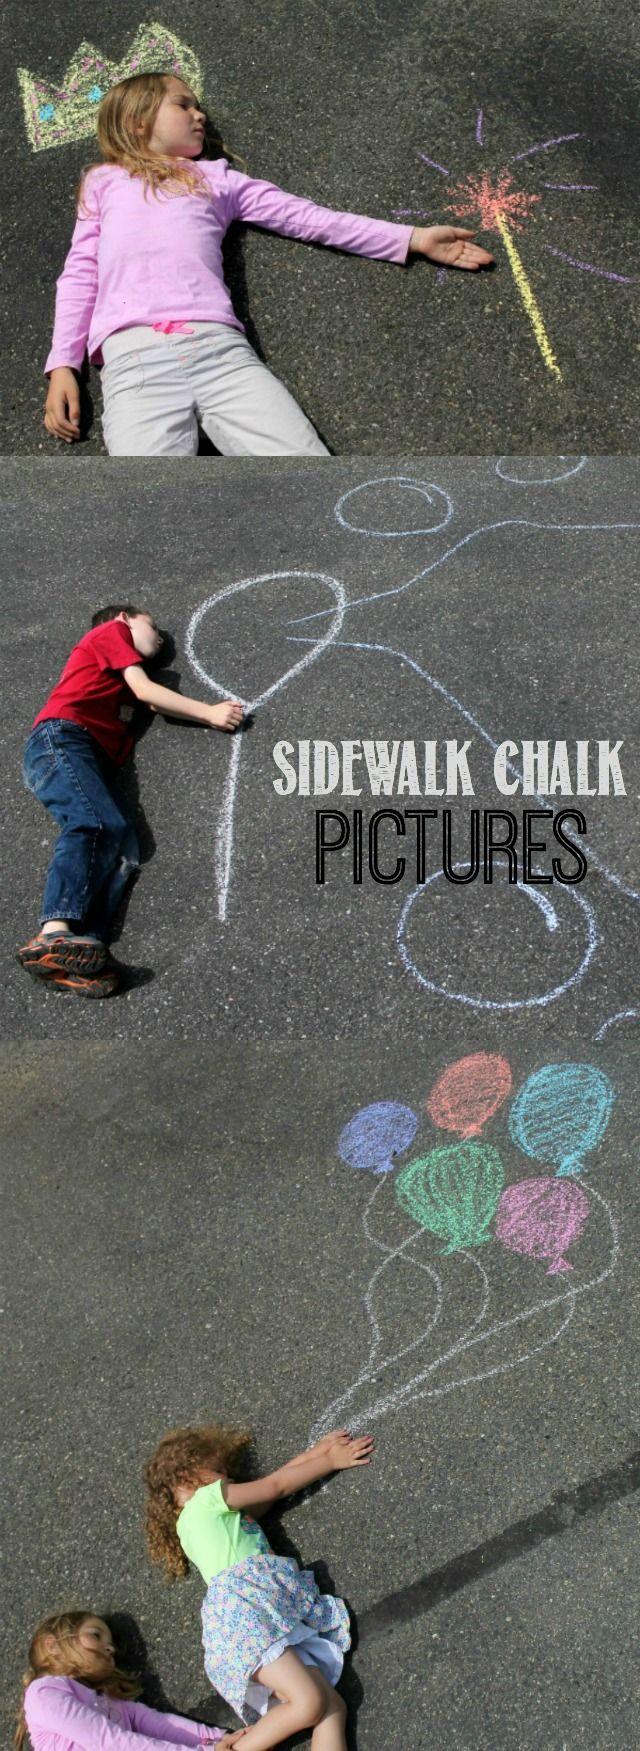 Sidewalk Chalk Pictures on www.girllovesglam.com